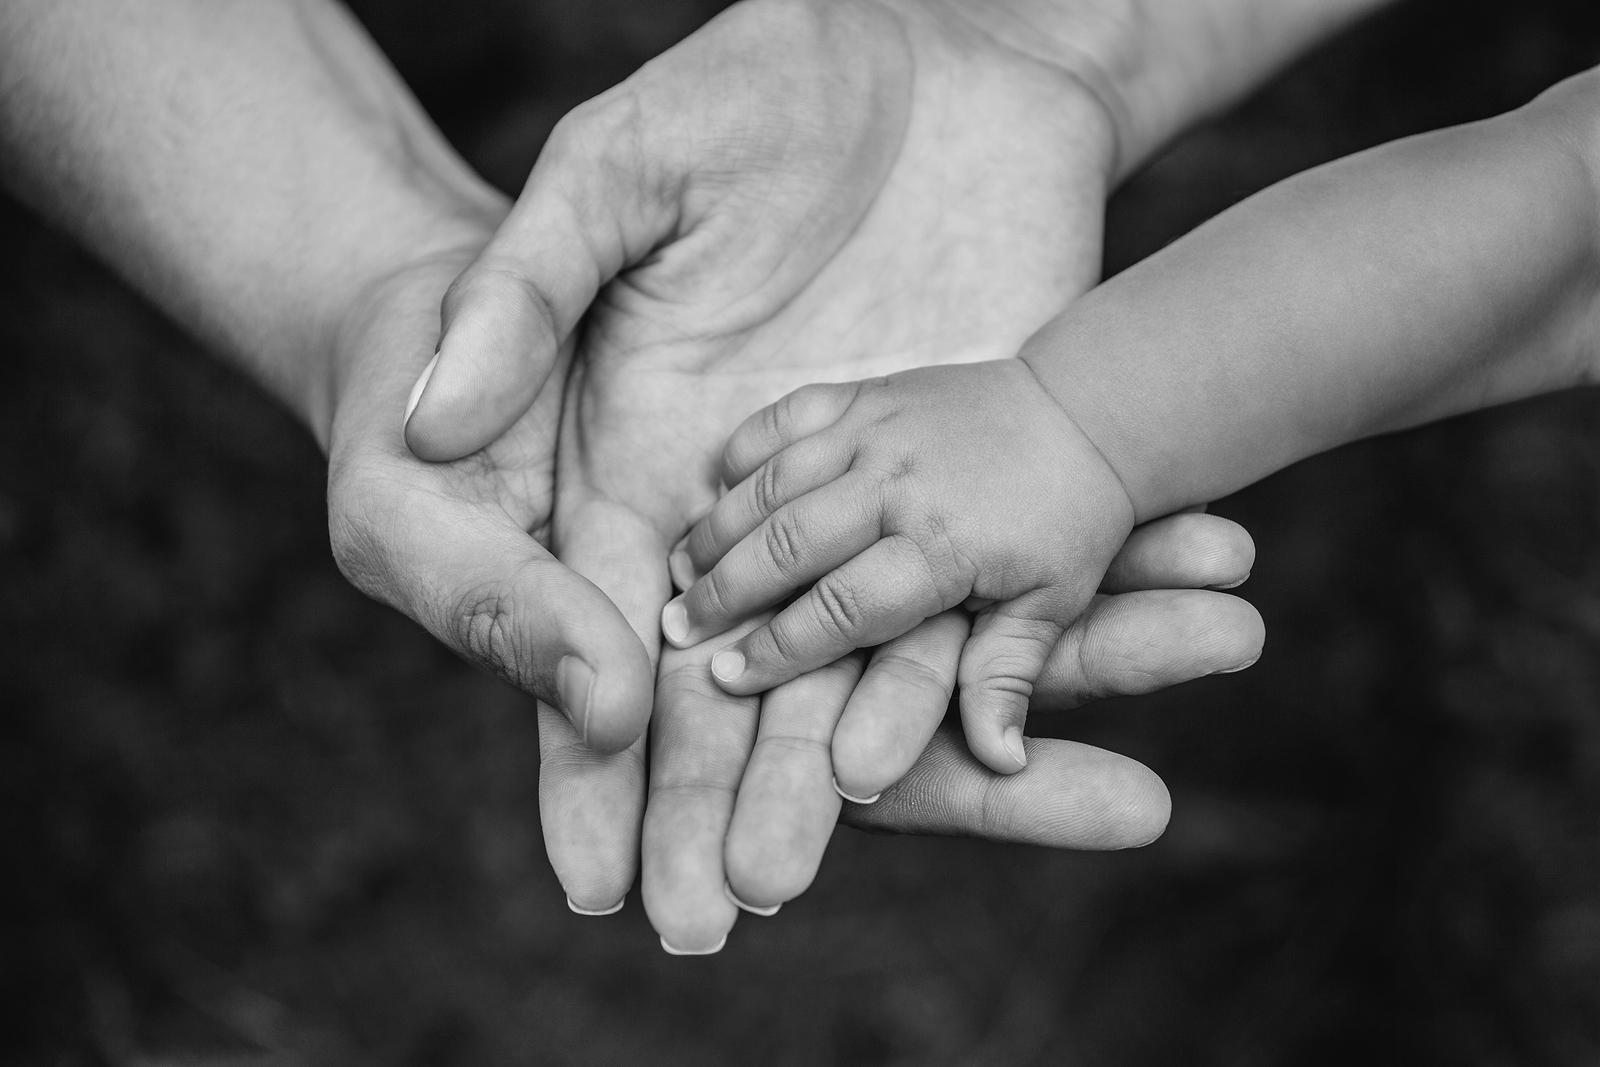 Family-Based U.S. Immigration